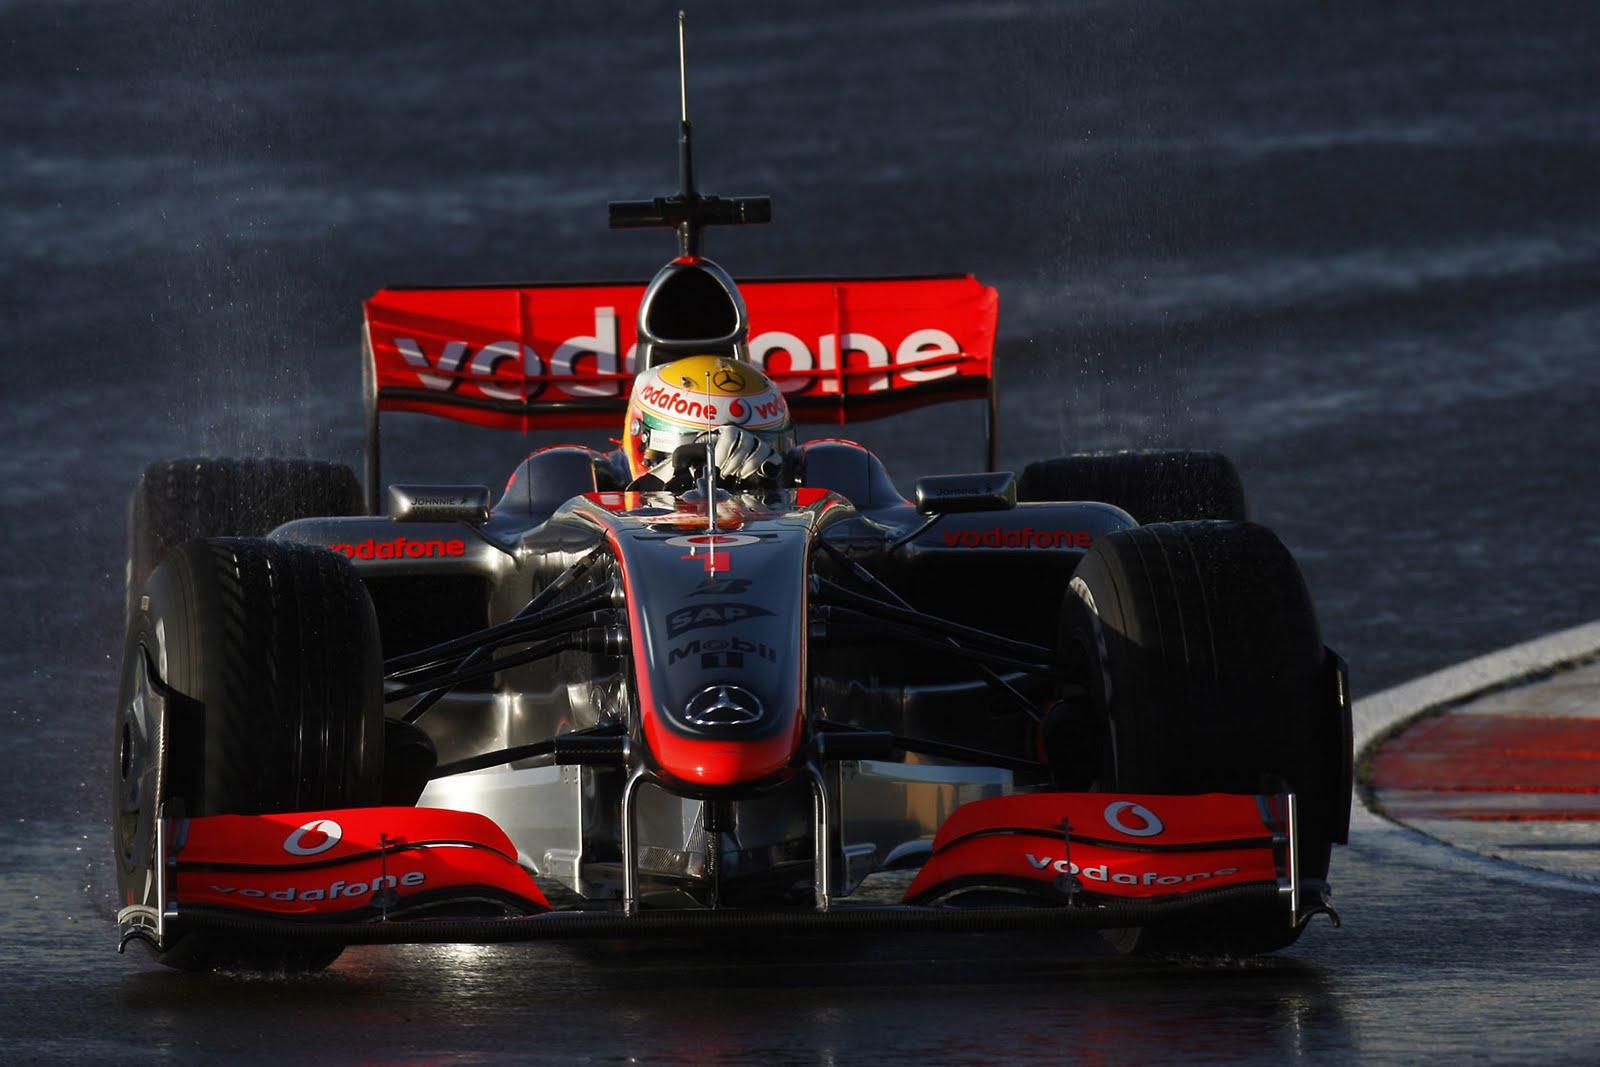 McLaren Mercedes Benz HD Formula 1 Wallpapers | Desktop Wallpapers